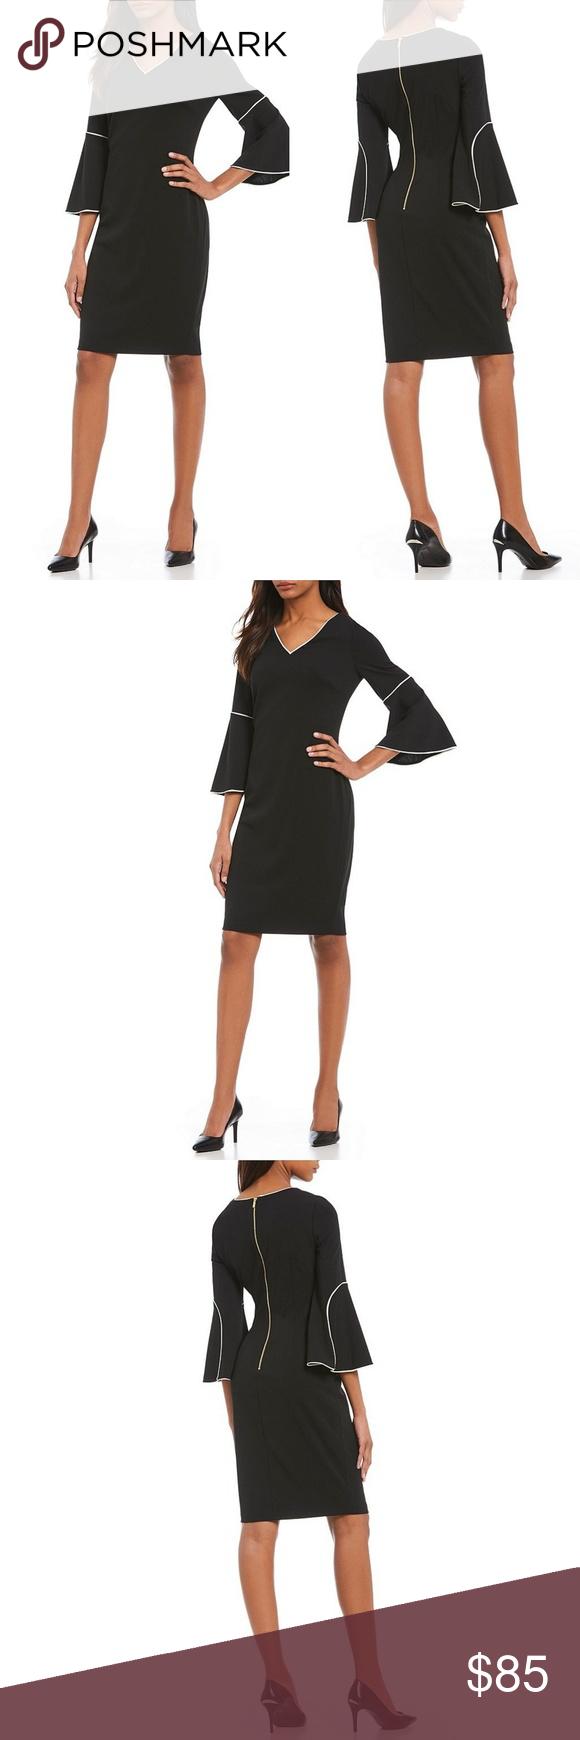 Off The Shoulder White Trimmed Black Dress Dresses Black Dress Clubwear Outfits [ 1338 x 1080 Pixel ]